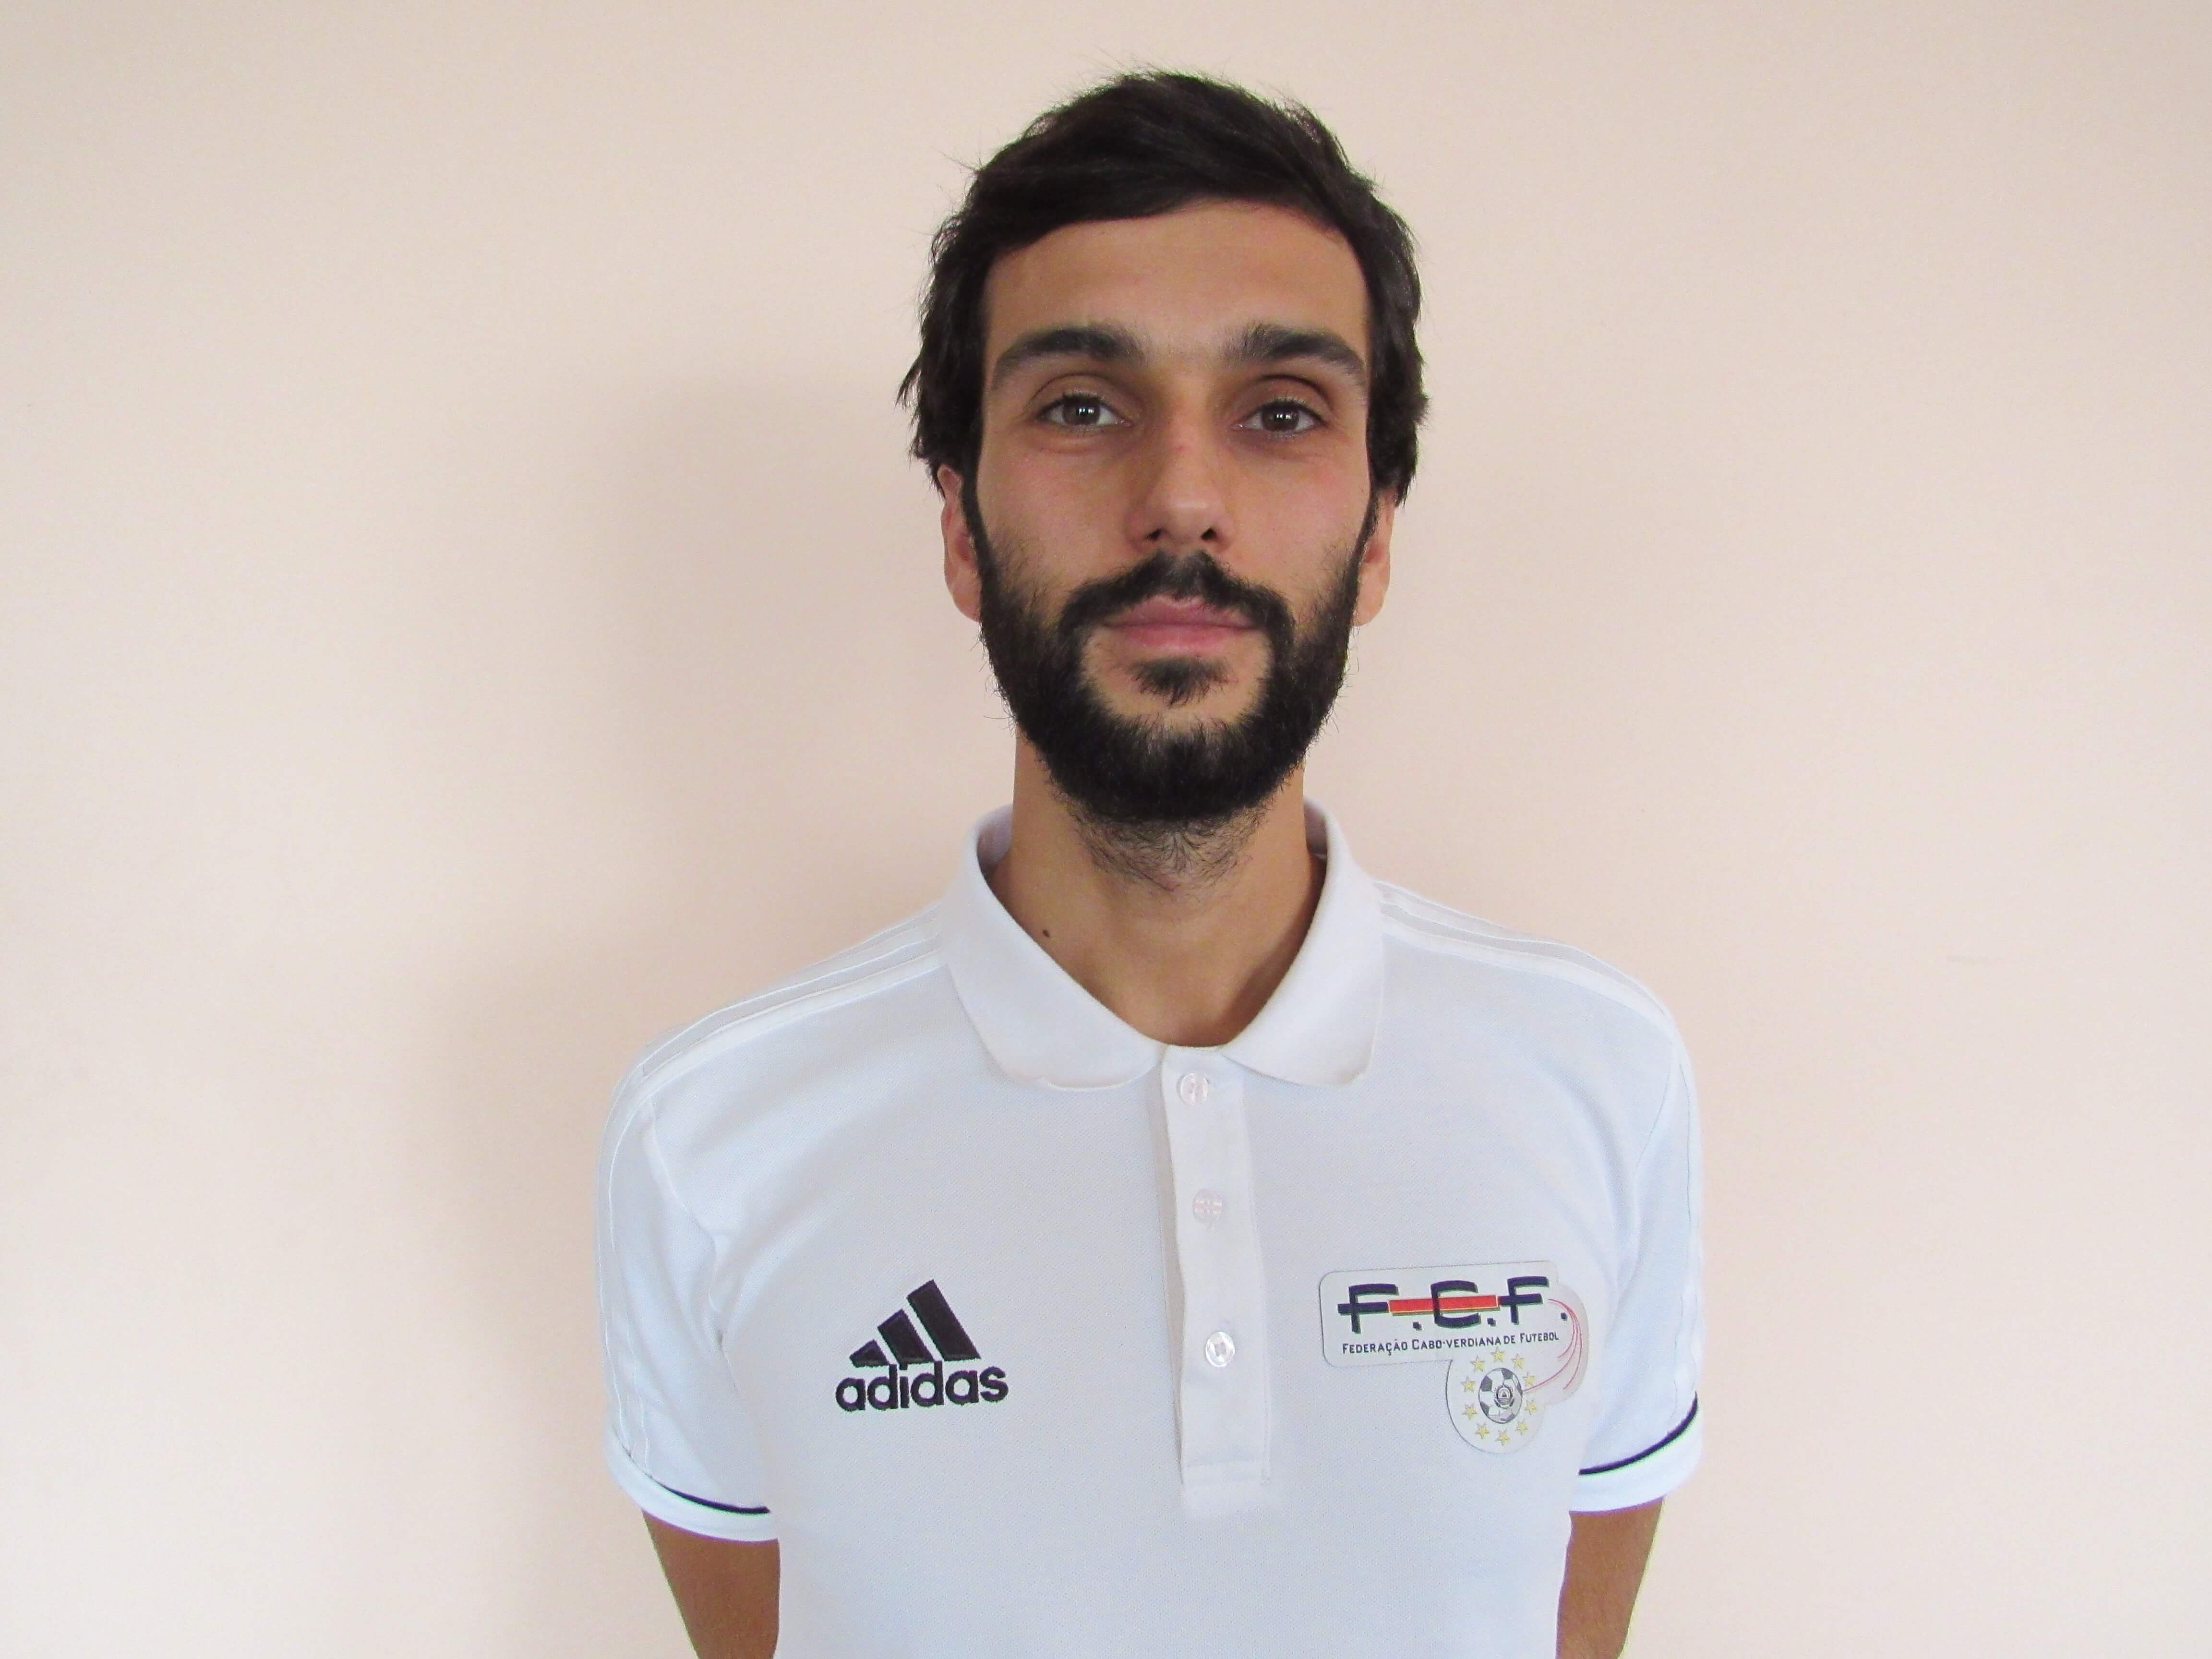 Pedro Figueiredo